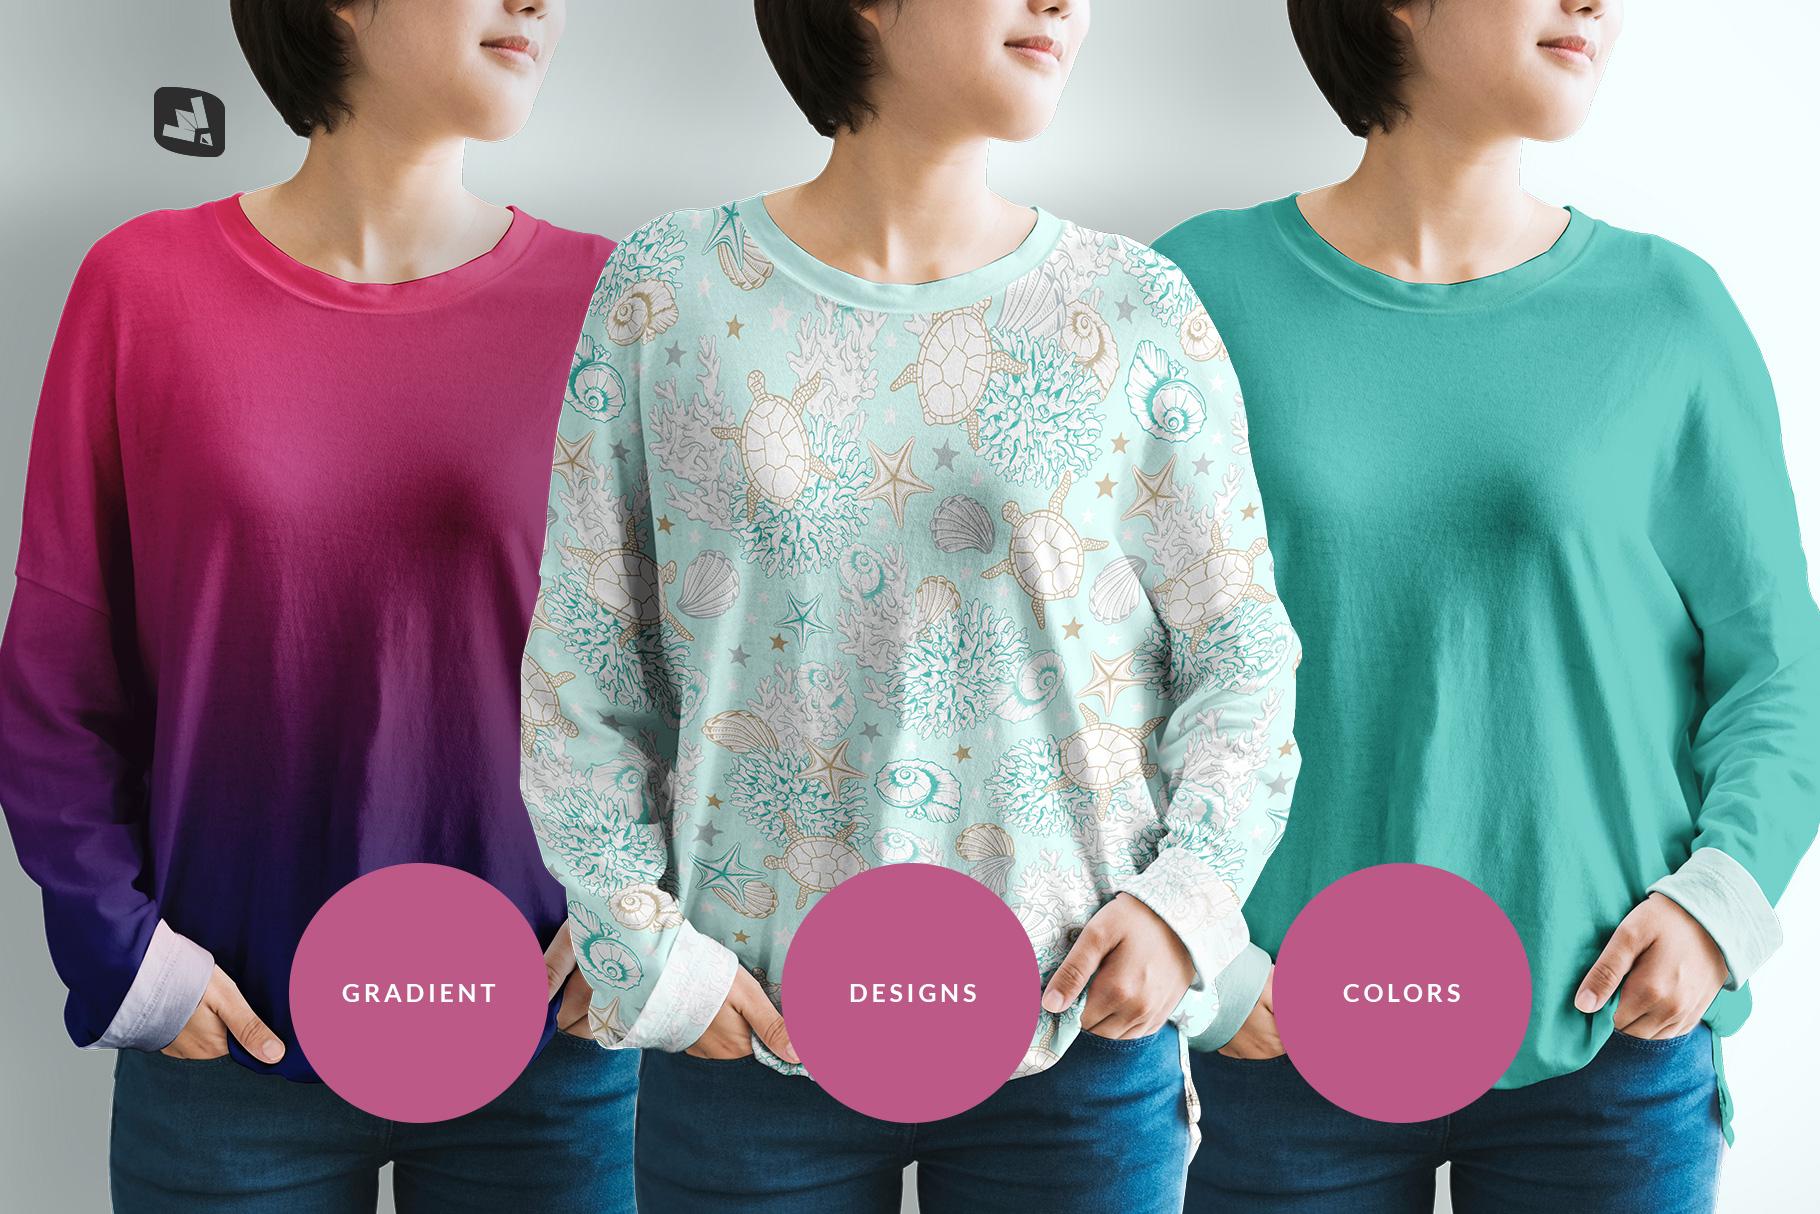 types of the women's full sleeve tshirt mockup